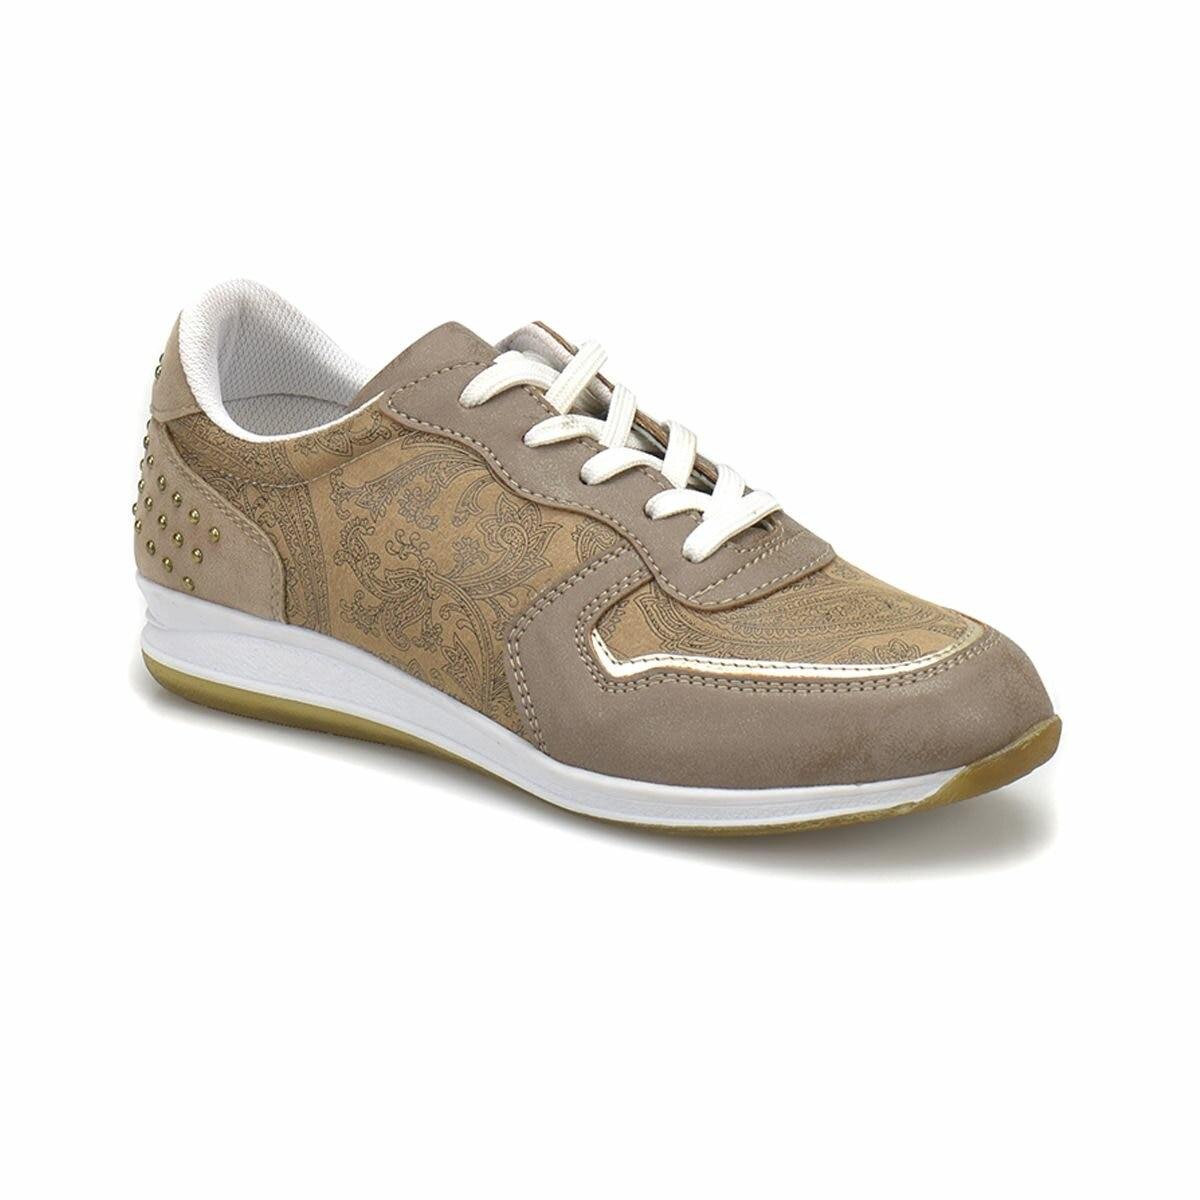 FLO CS18024 Brown Women 'S Sports Shoes Art Bella